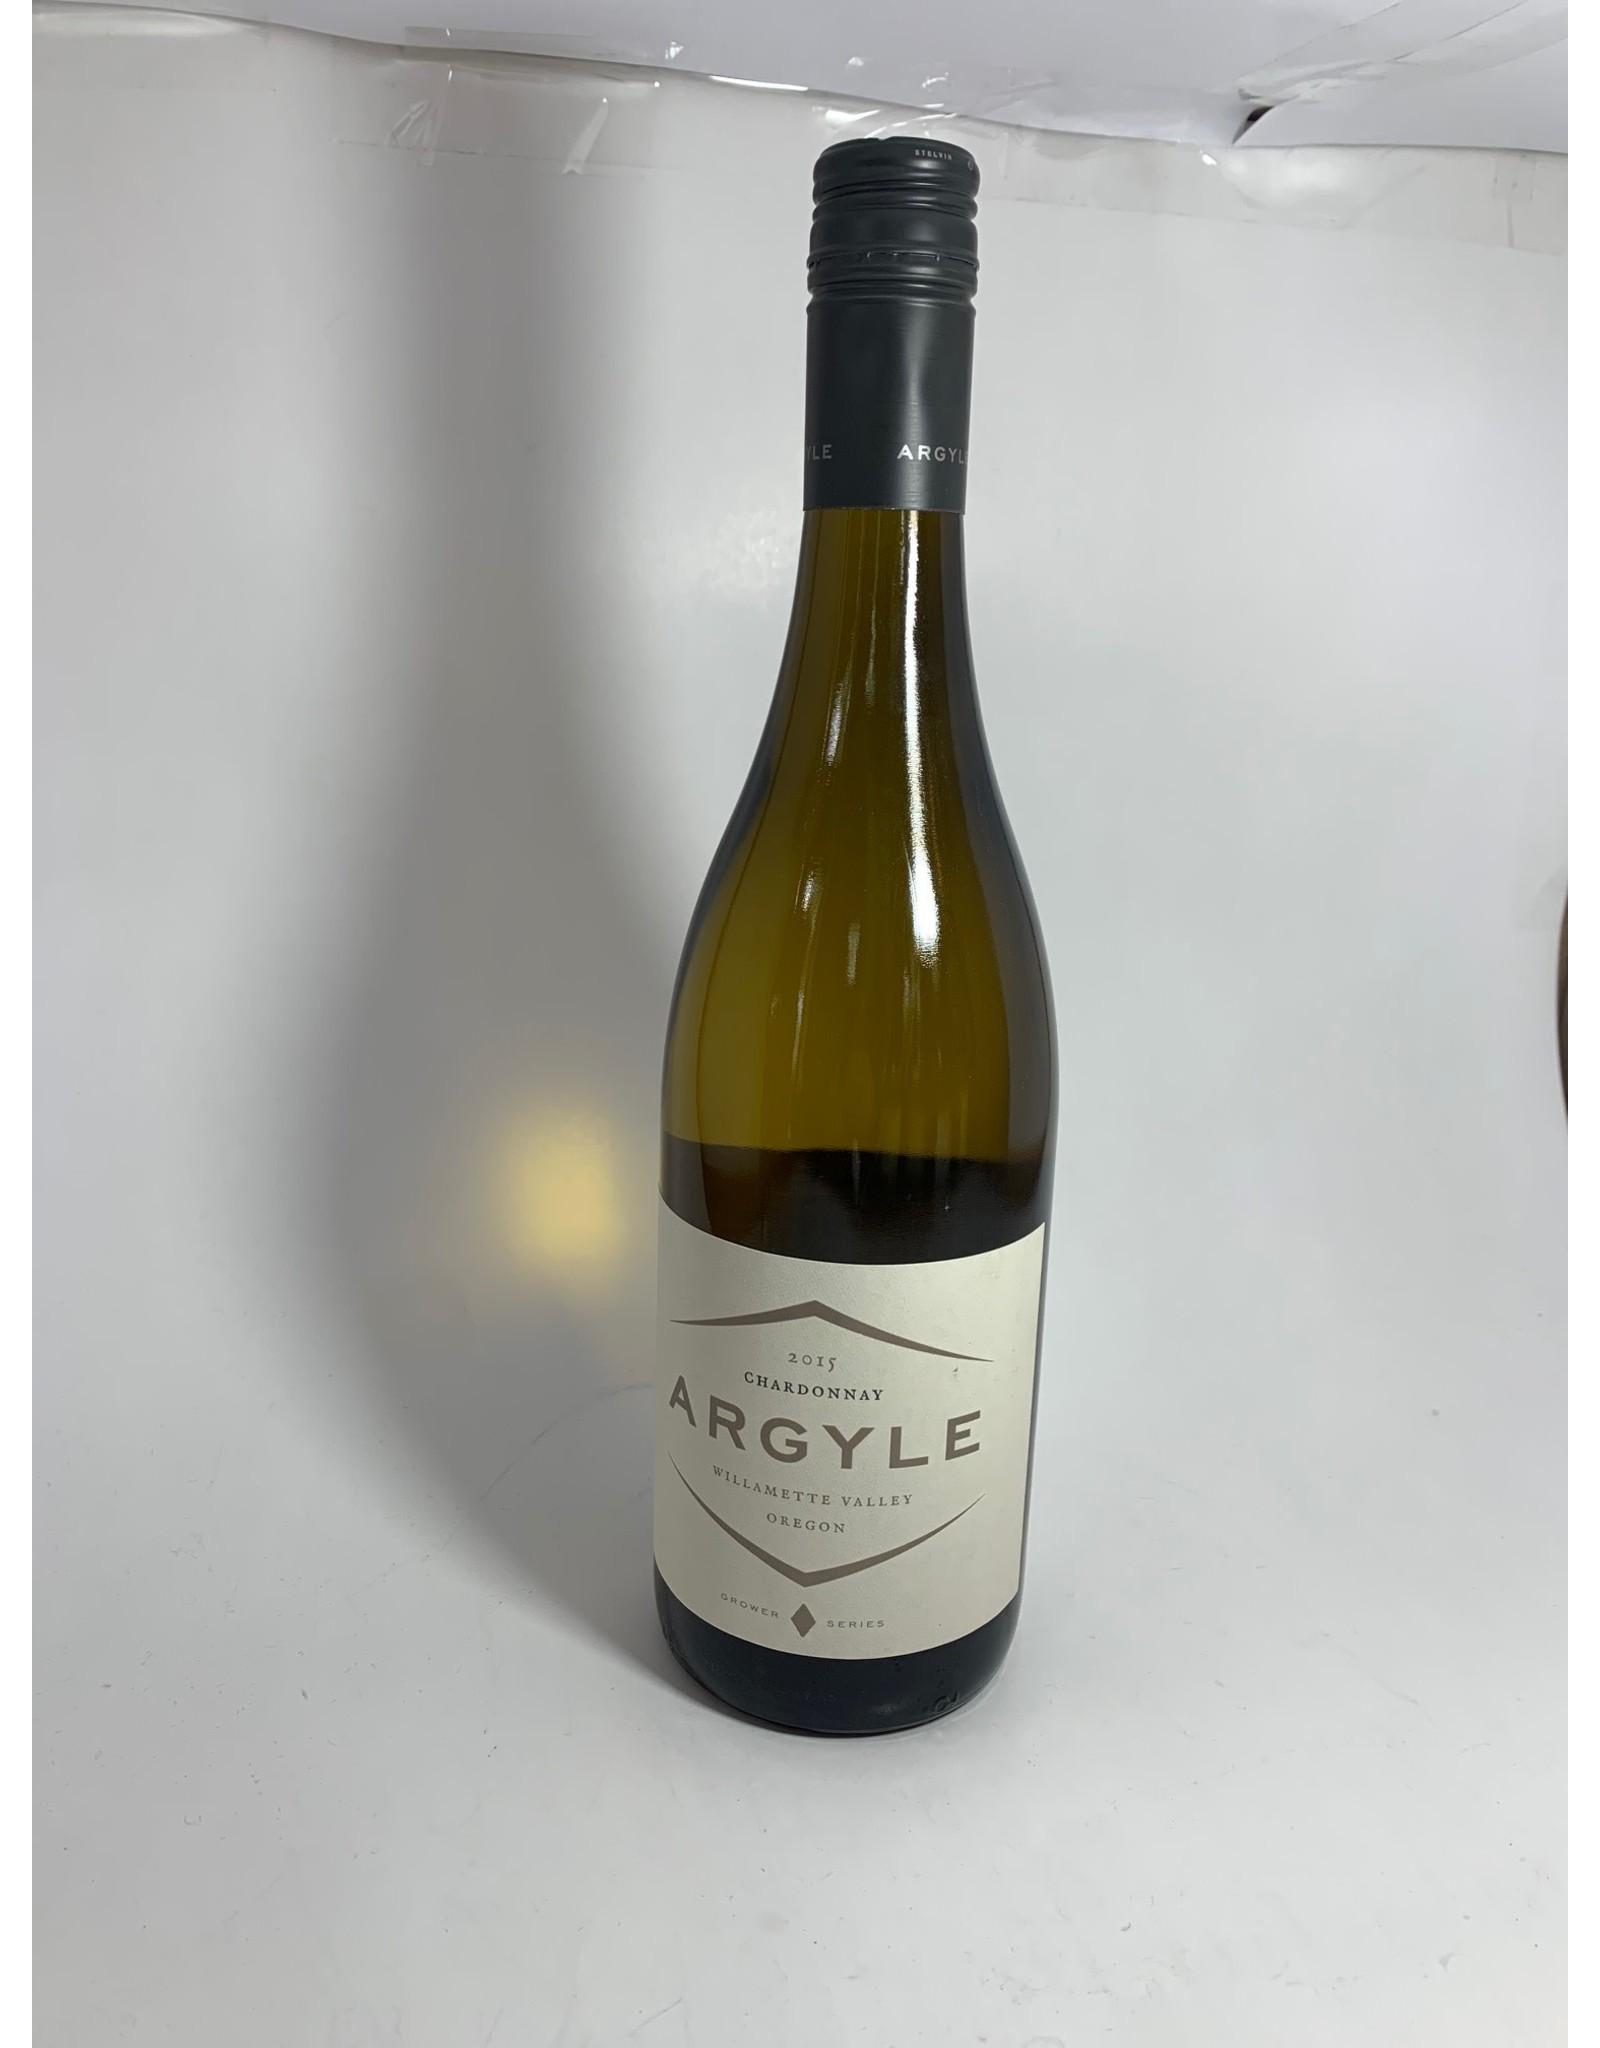 Argyle Chardonnay